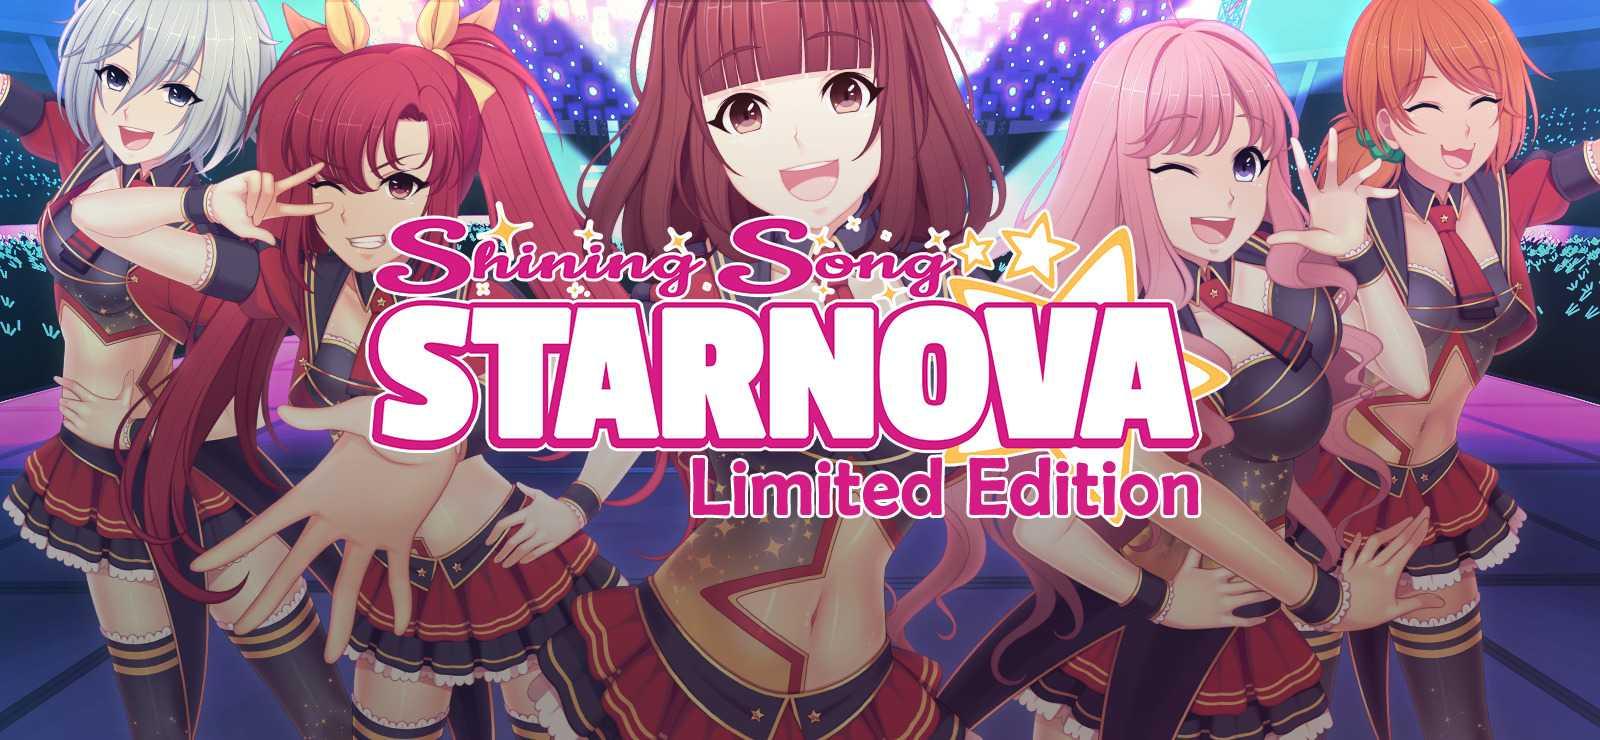 Shining Song Starnova Limited Edition